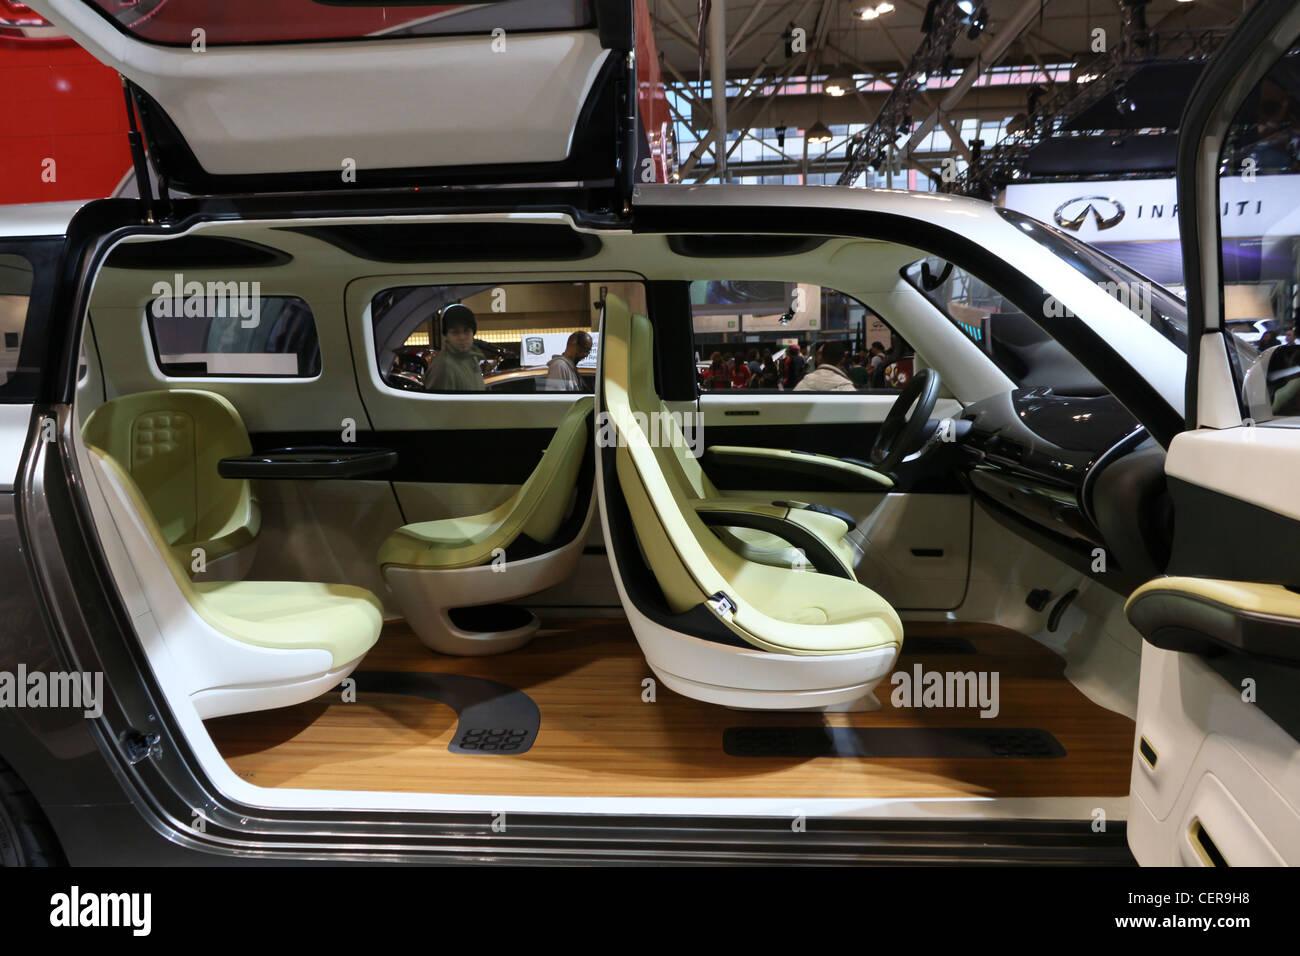 Futuristic Concept Car Interior Seats Stock Photo 43538356 Alamy